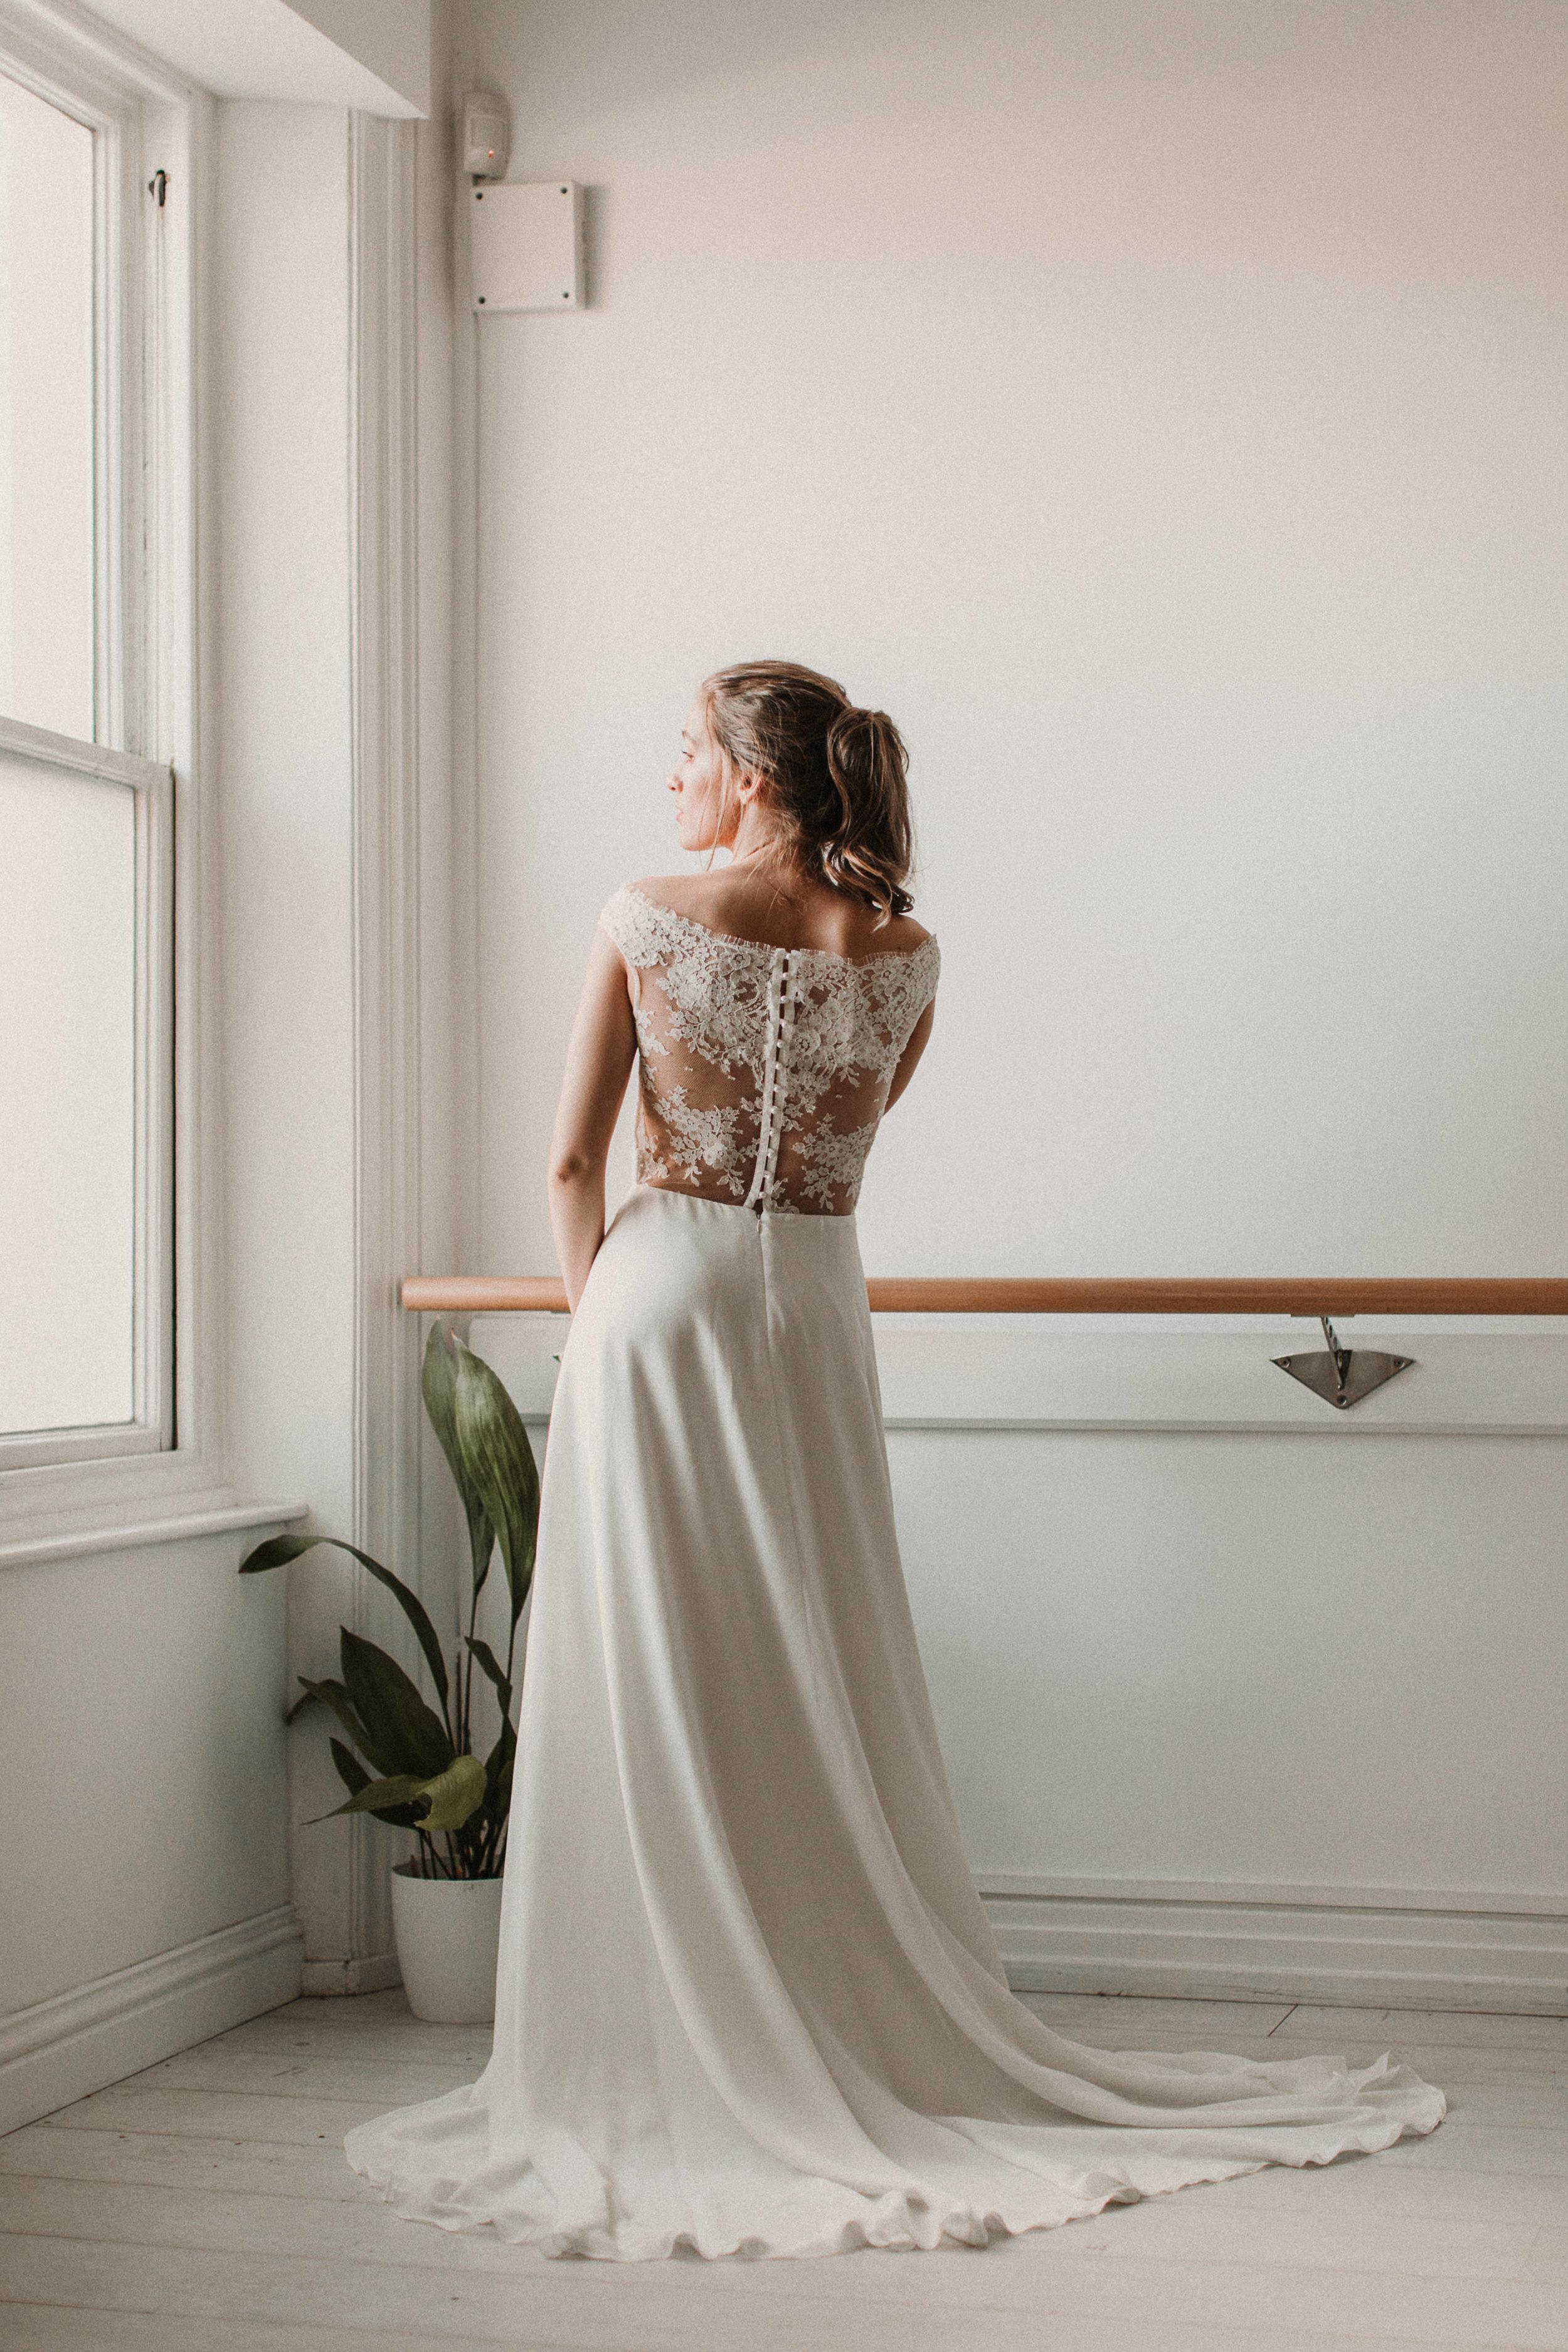 npluck_luna_bride-163.jpg